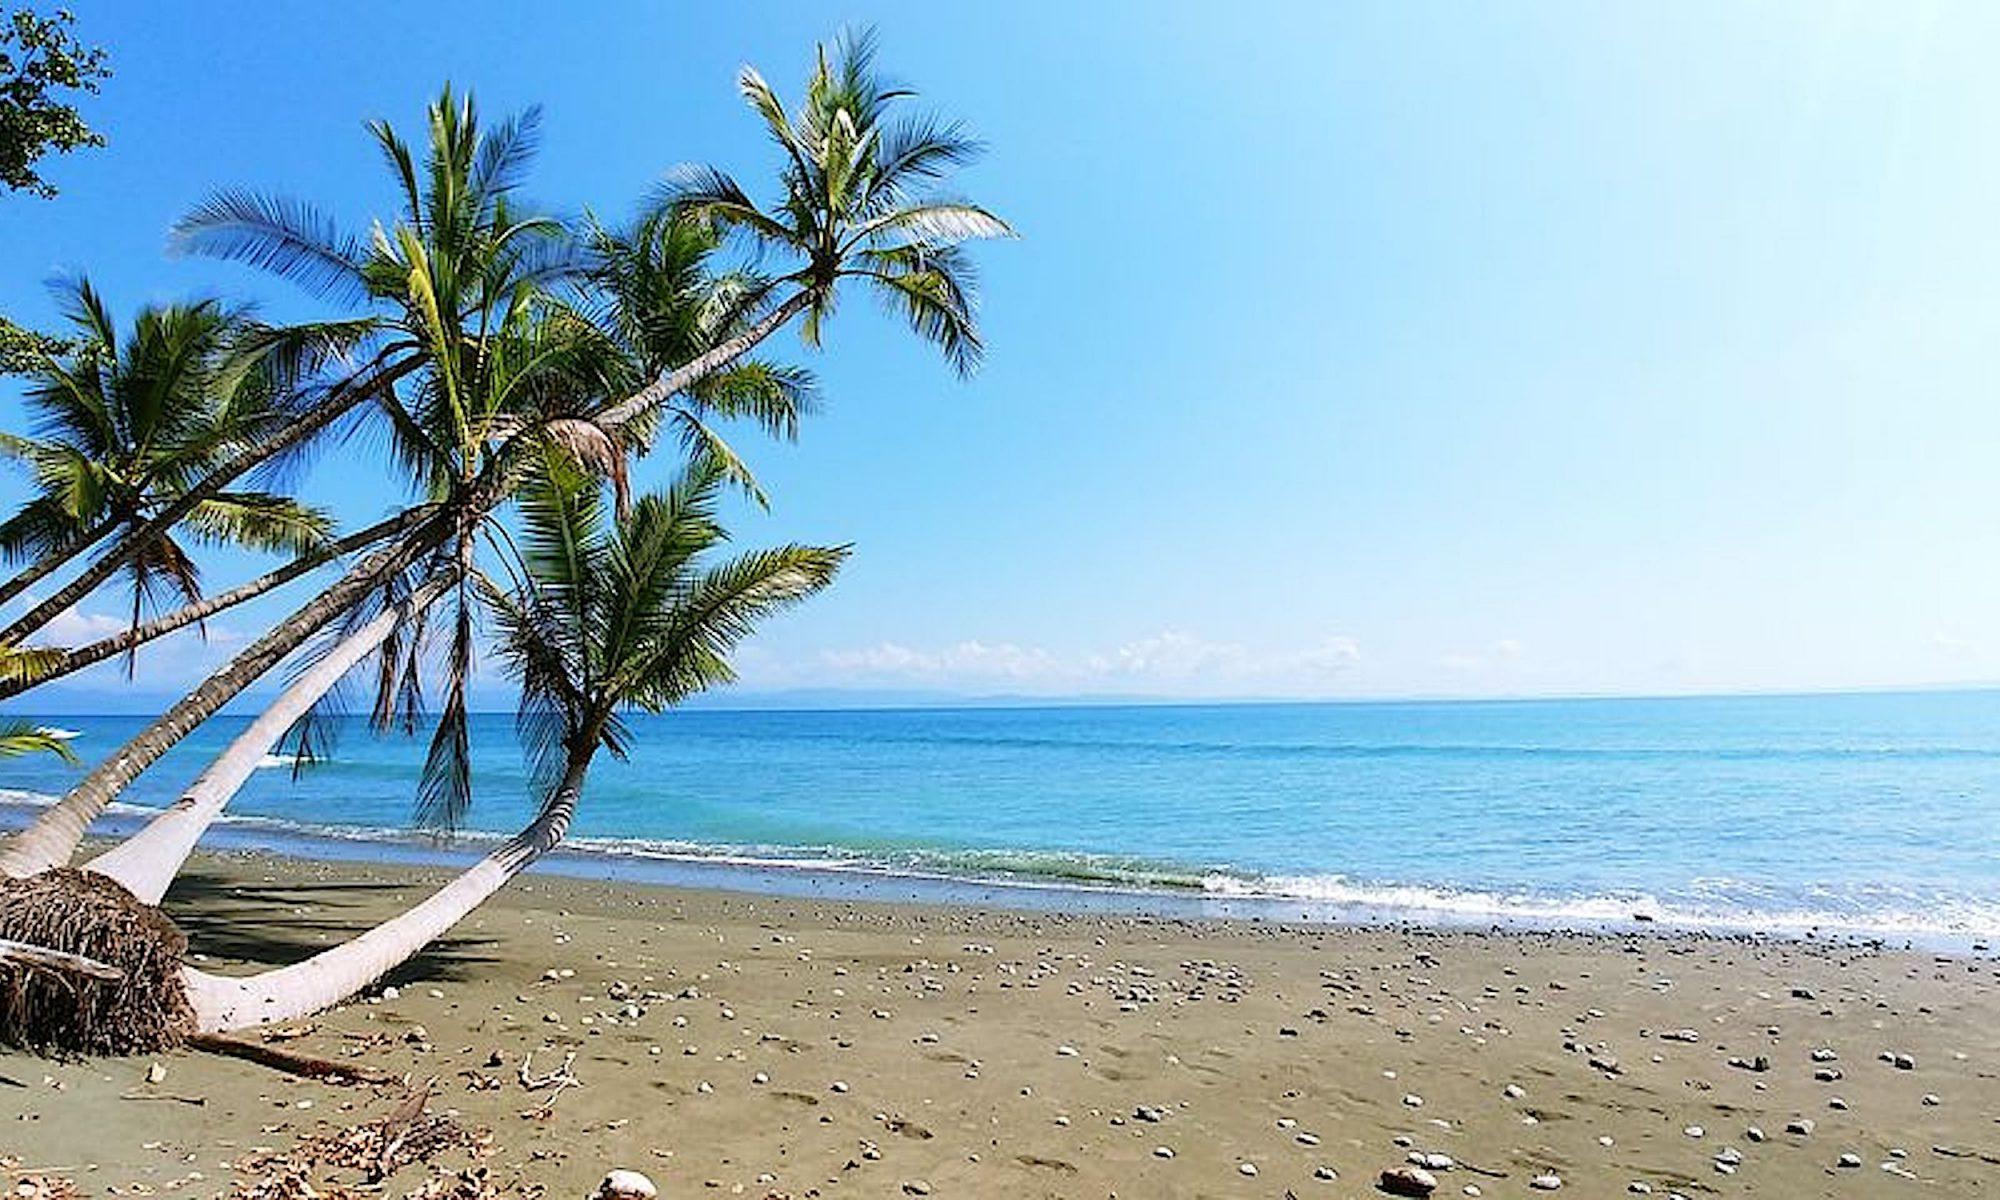 Naturbelassener Strand Costa Rica